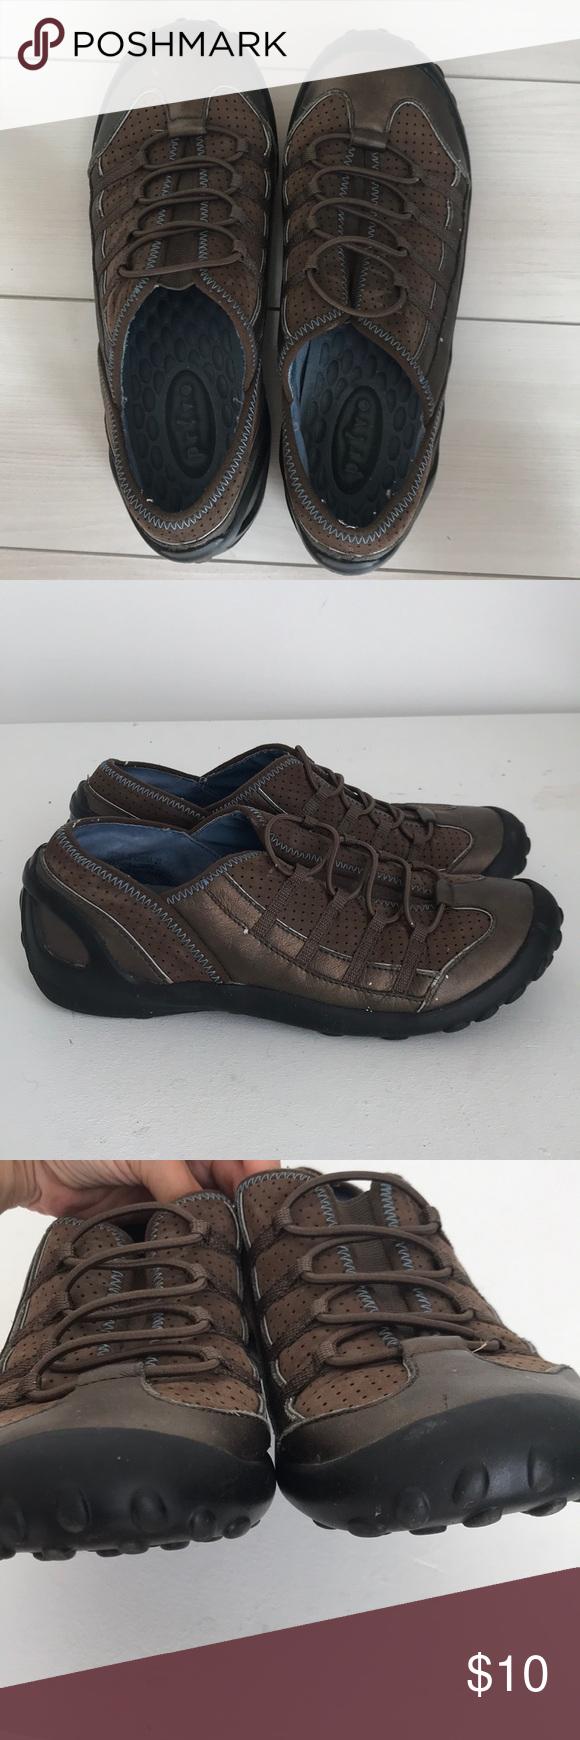 Clarks Privo slip on sneakers leather